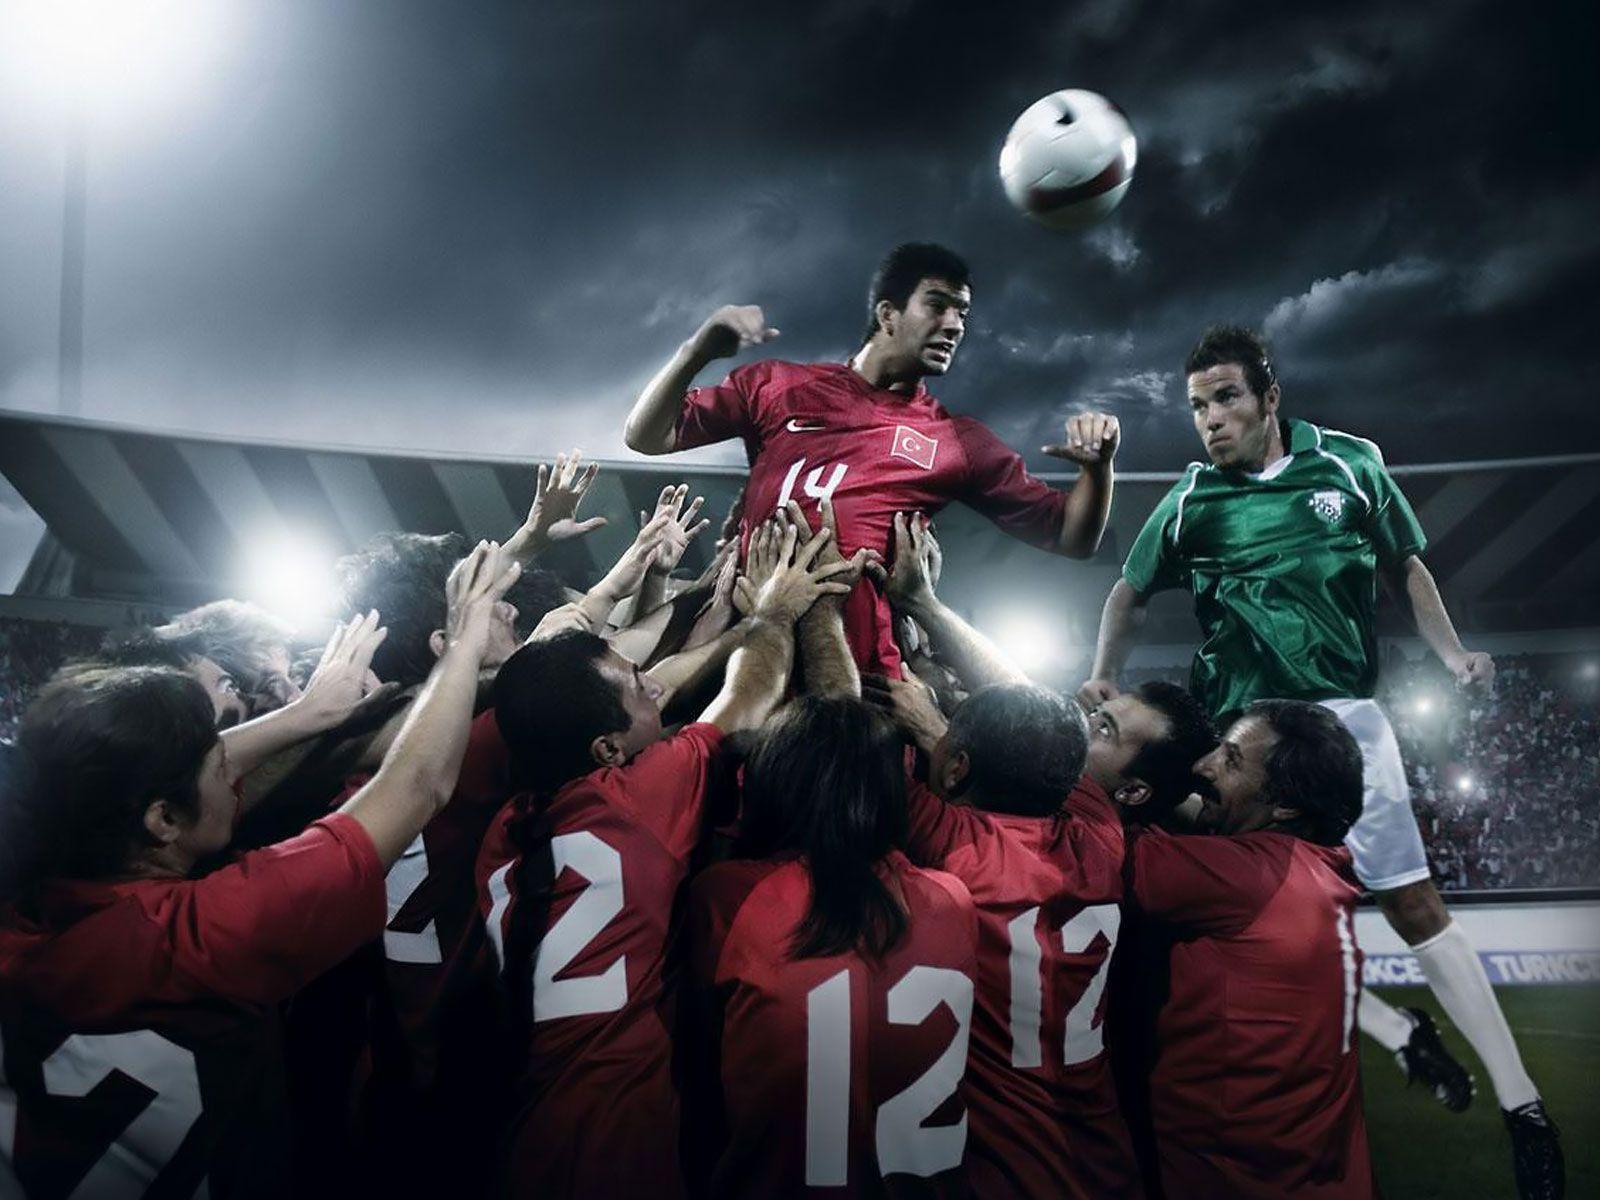 Desktop Wallpaper · Gallery · Sports · FIFA World Cup | Free ...